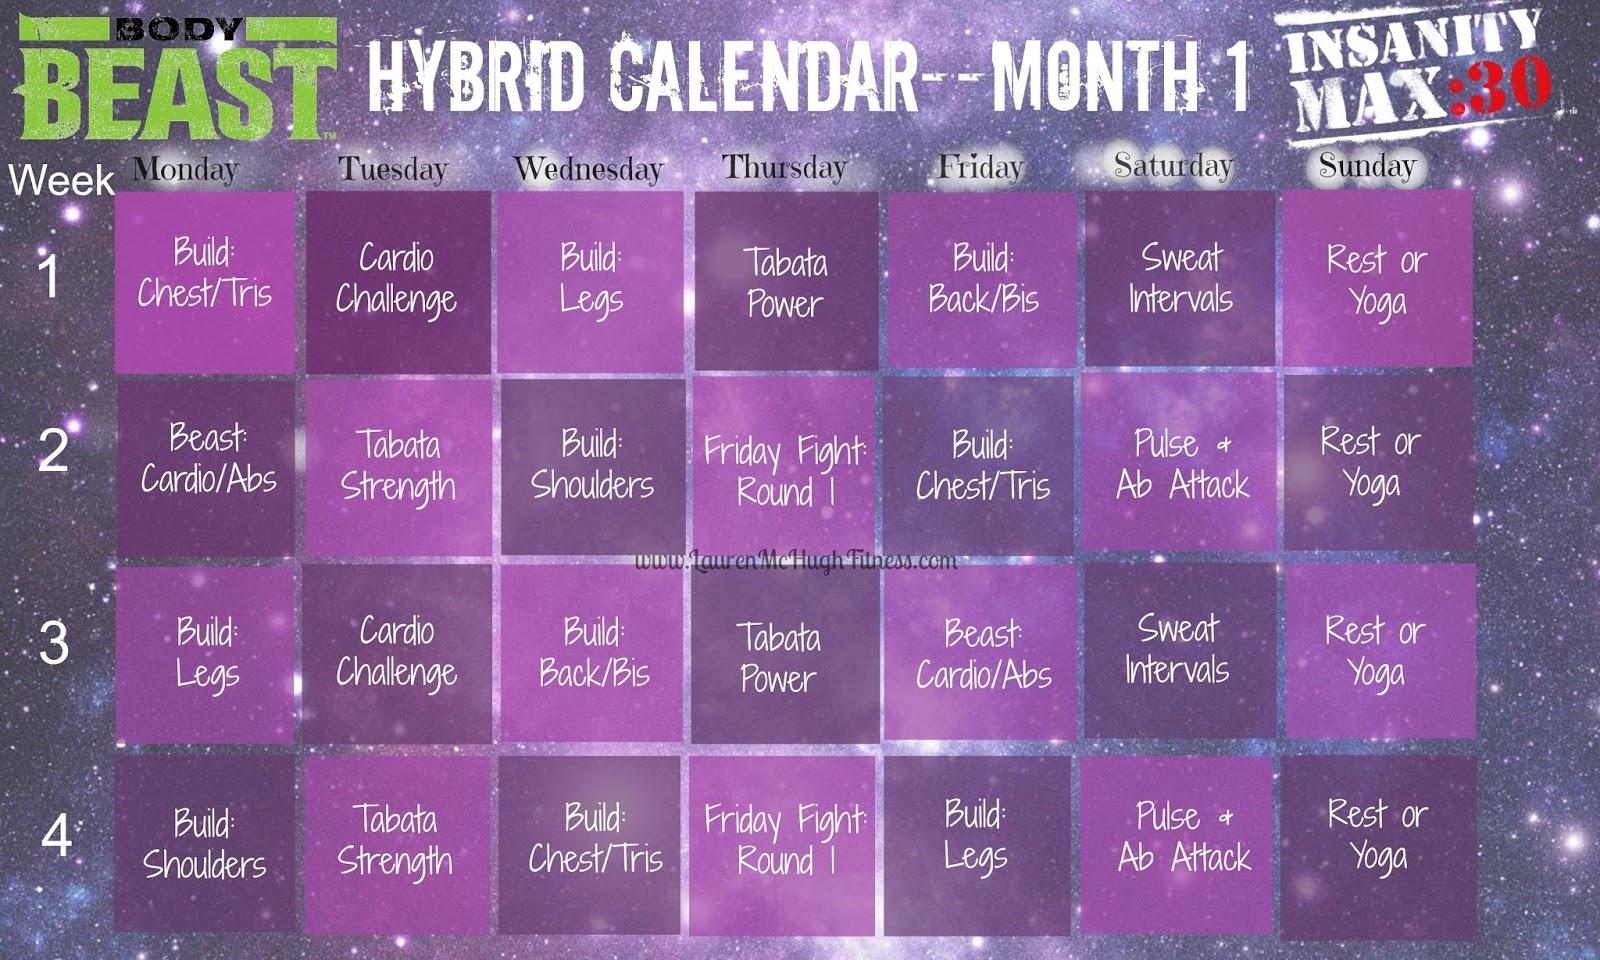 August 2015 | Lauren Mchugh regarding Insanity Max 30/piyo Hybrid Calendar